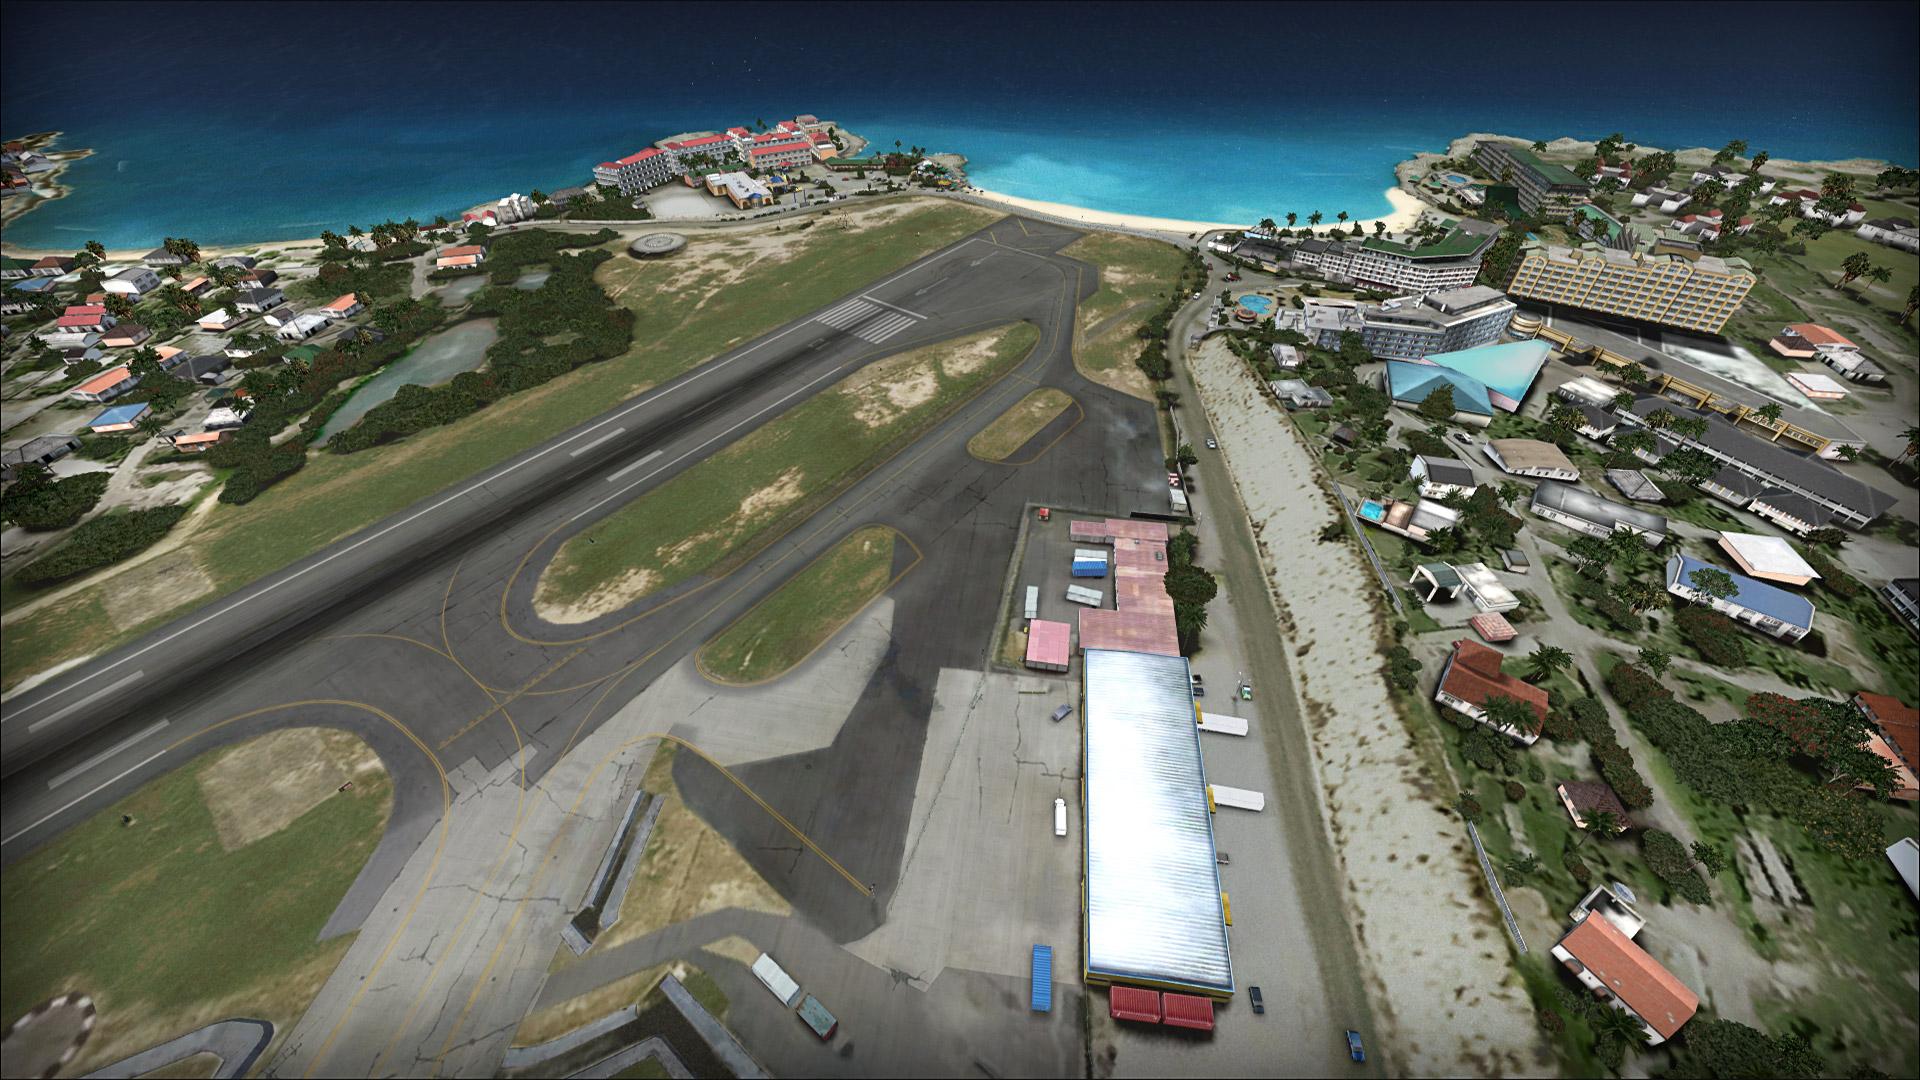 Fsx Flytampa St Maarten Tncm Airport Layout - logpolv